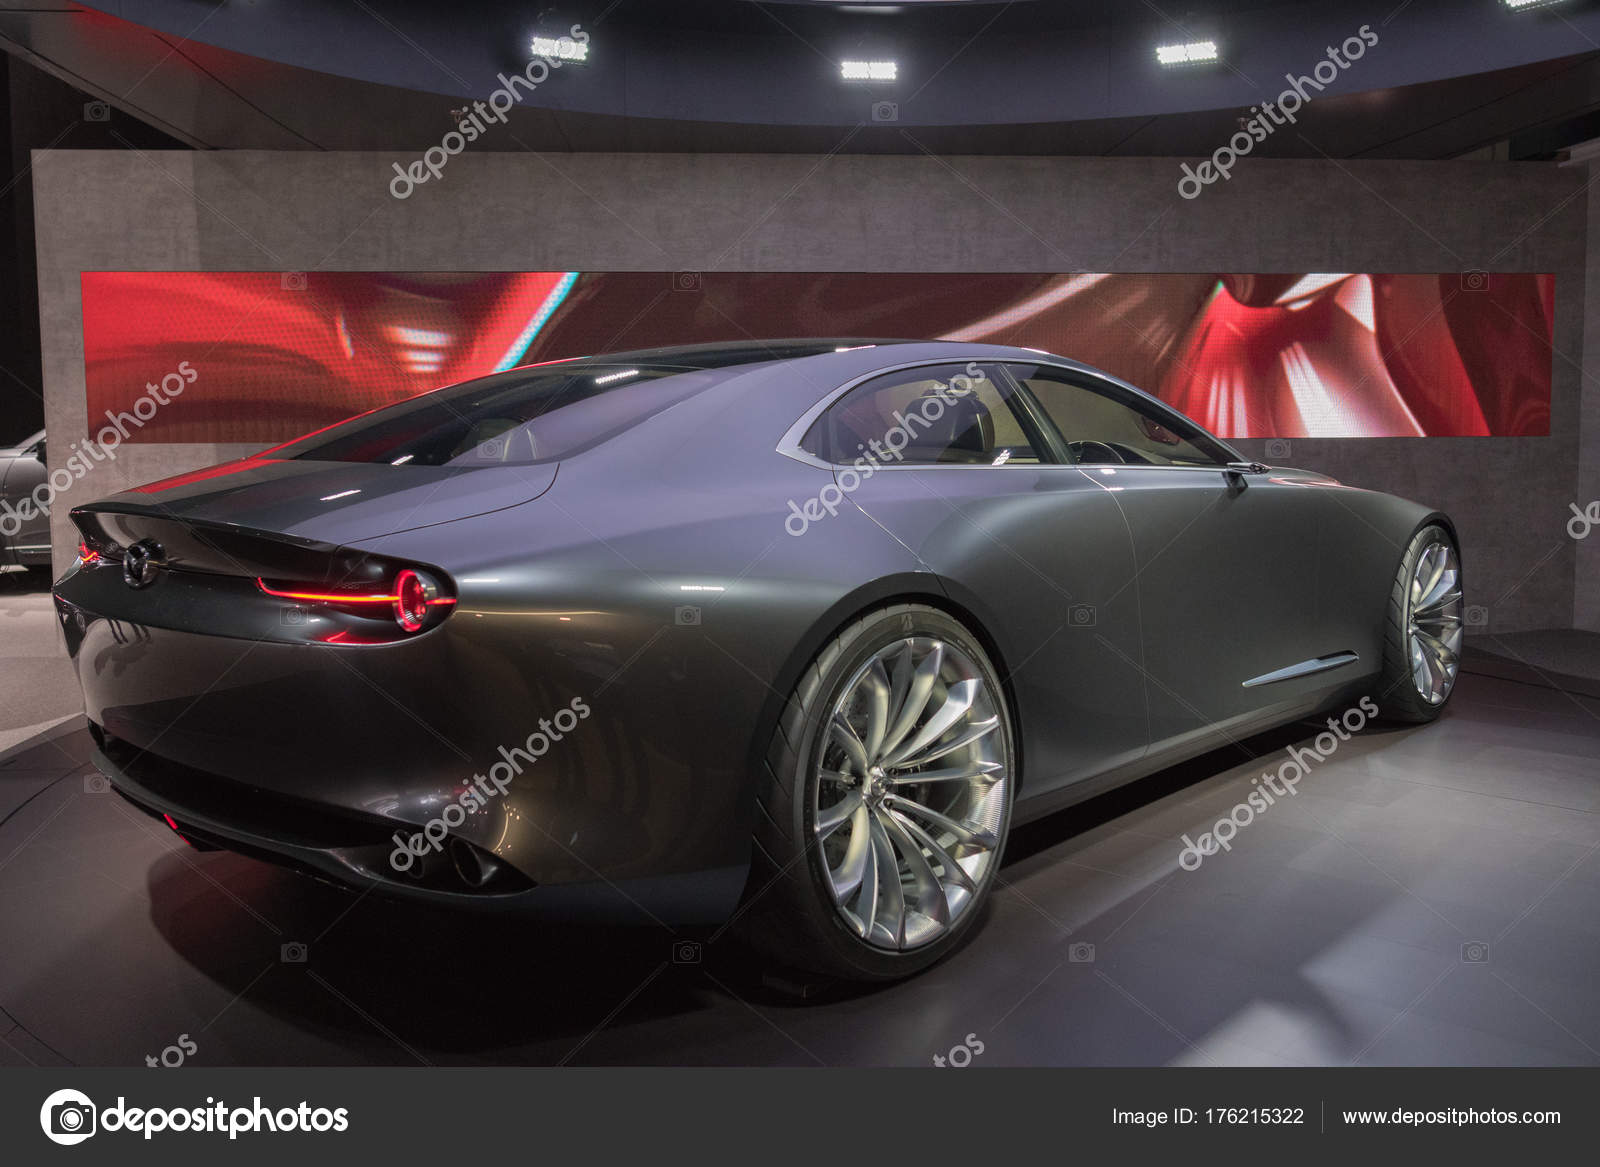 https://st3.depositphotos.com/1955233/17621/i/1600/depositphotos_176215322-stock-photo-mazda-vision-coupe-concept-on.jpg